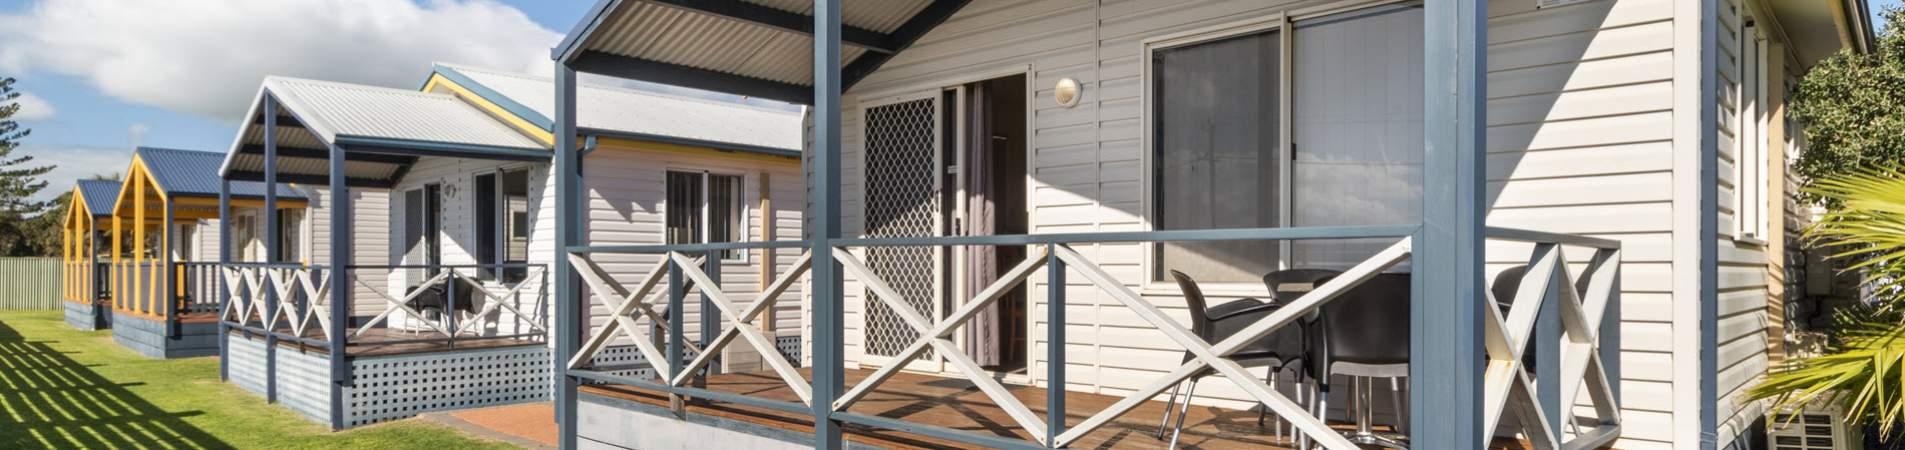 geraldton belair gardens caravan park accommodation - banner 2